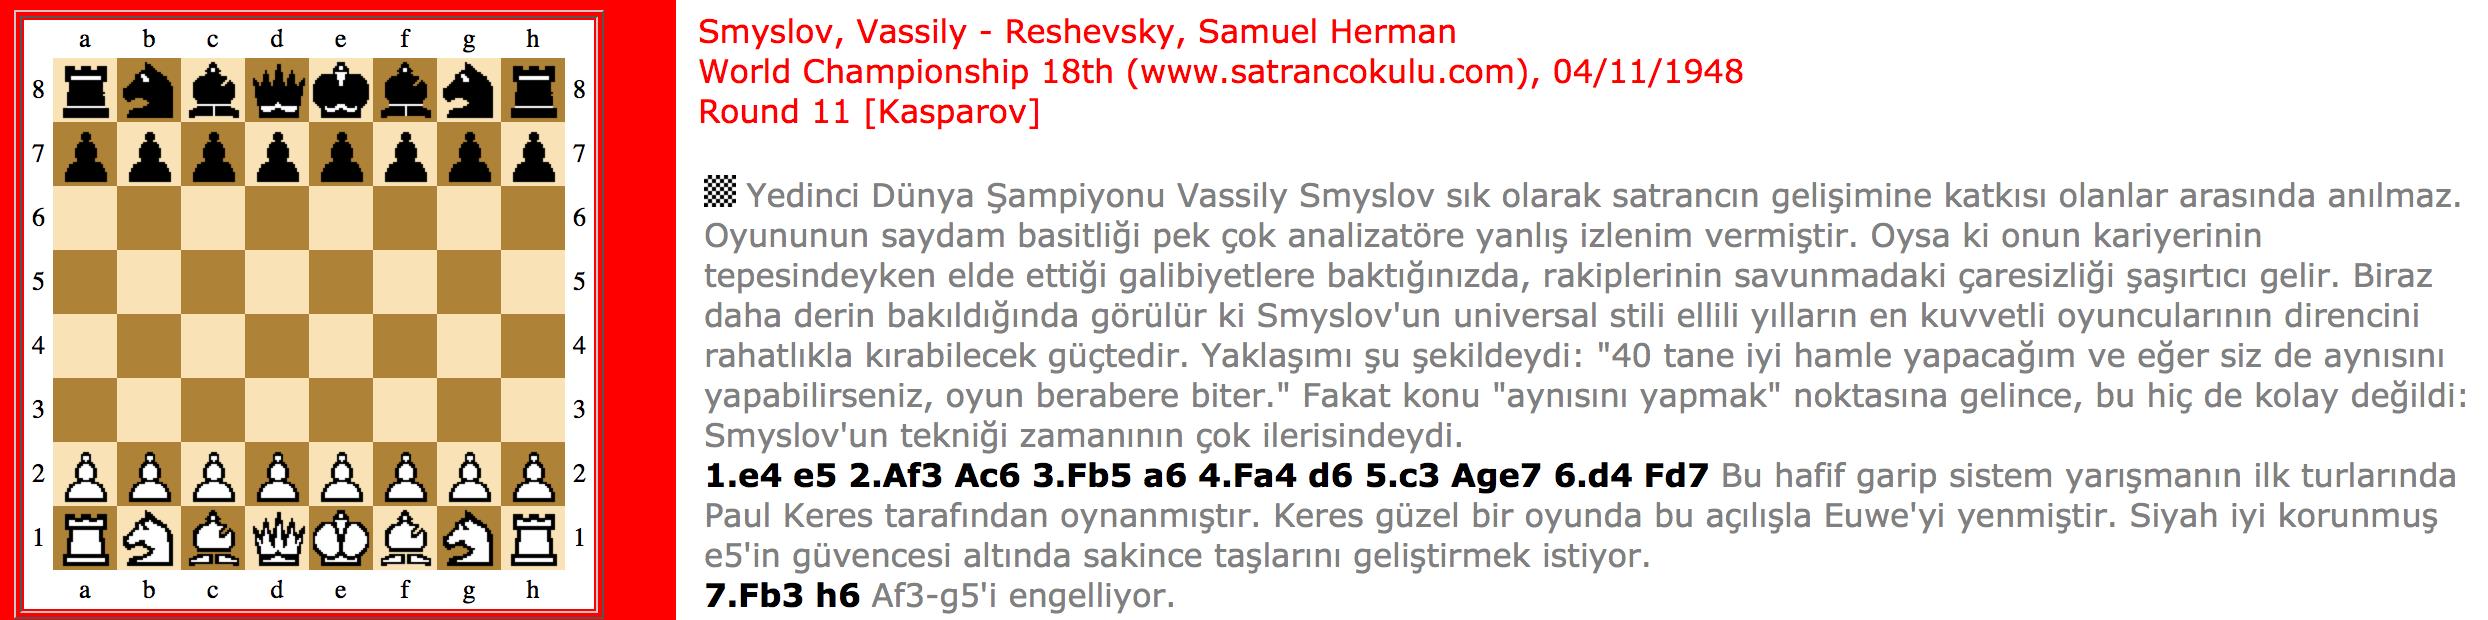 Smyslov – Reshevsky